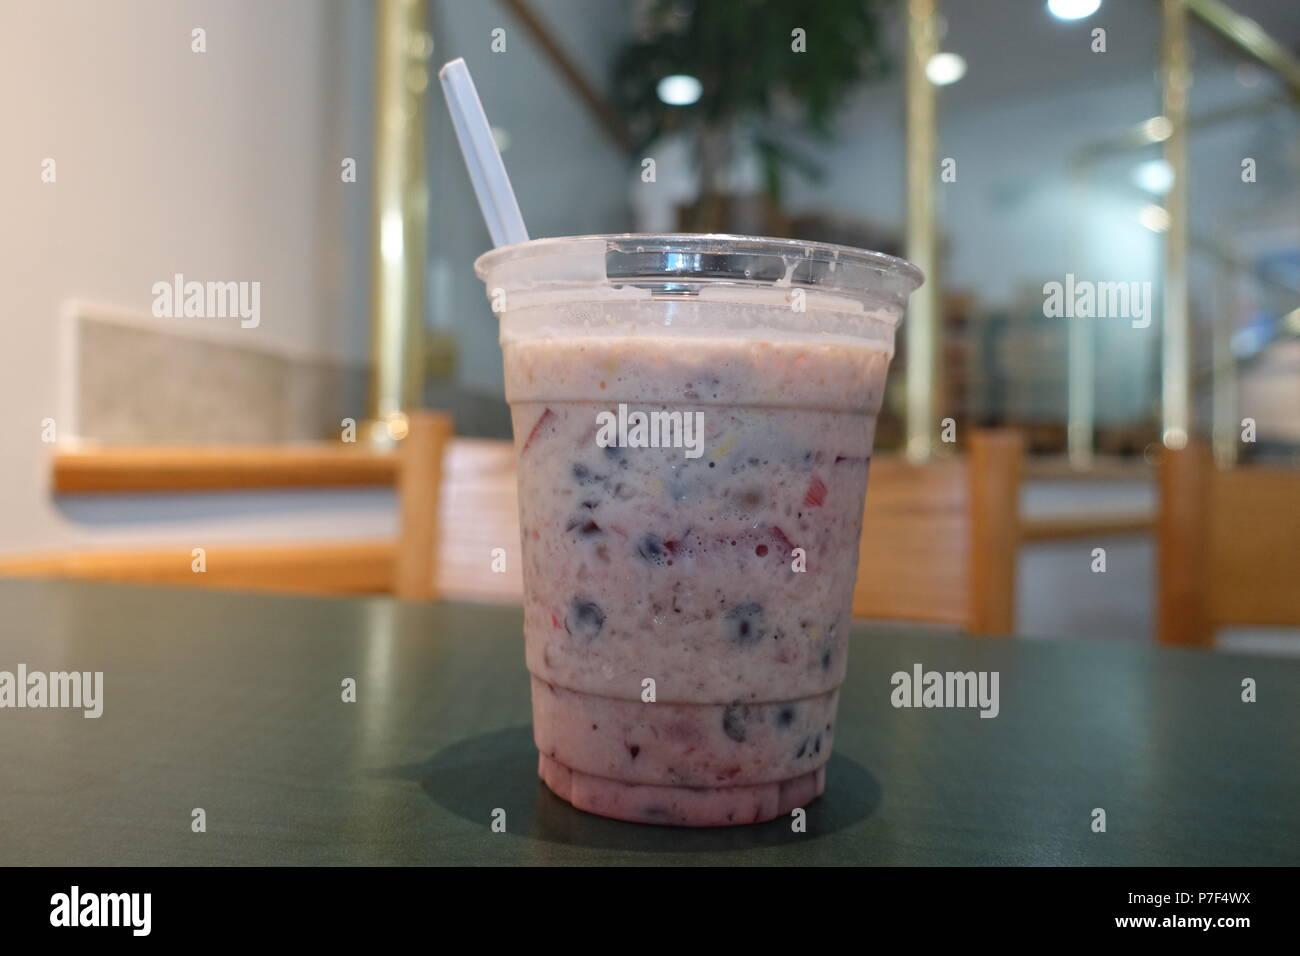 Filipino Desserts Stock Photos & Filipino Desserts Stock Images - Alamy